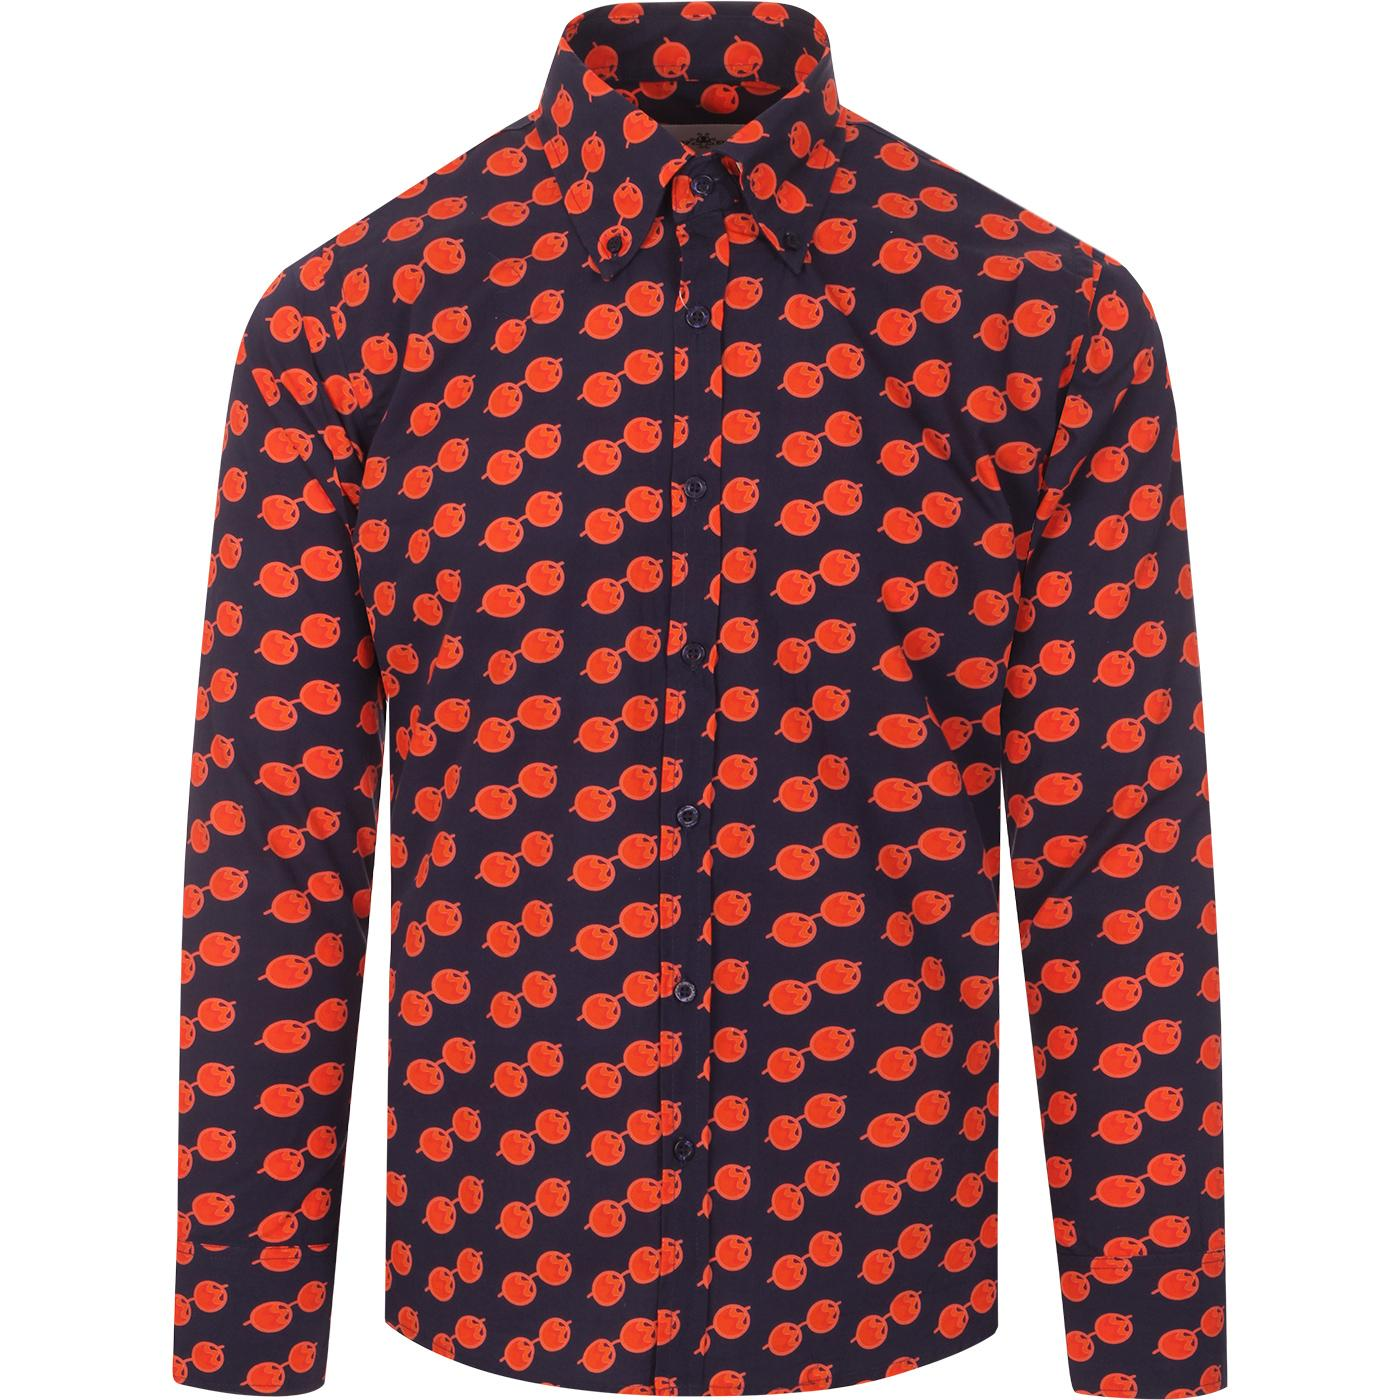 Trip Lennon Glasses MADCAP ENGLAND Retro 60s Shirt